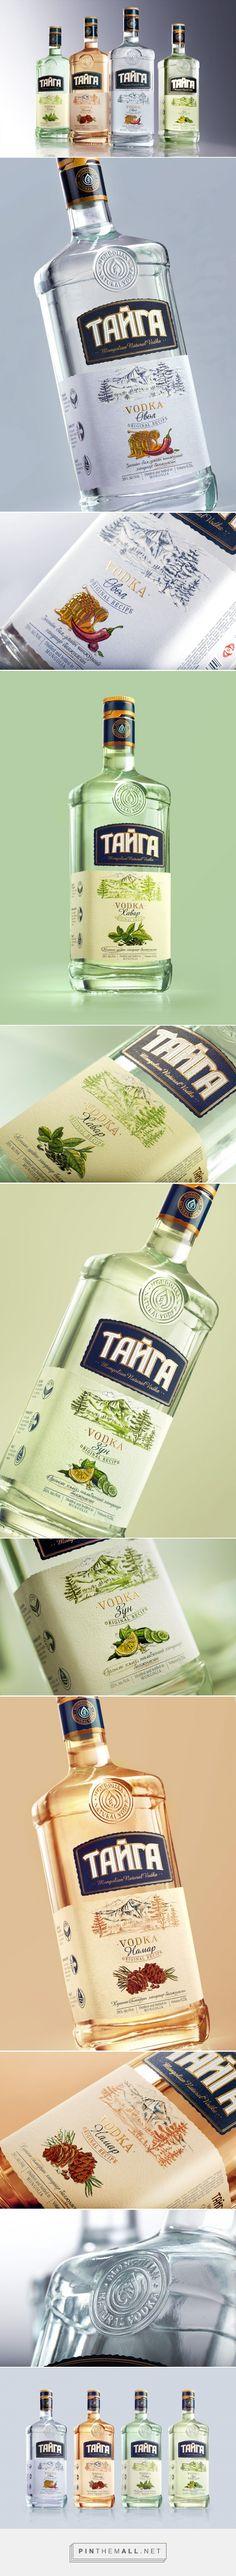 Taiga Vodka - Packaging of the World - Creative Package Design Gallery - http://www.packagingoftheworld.com/2016/12/taiga-vodka.html